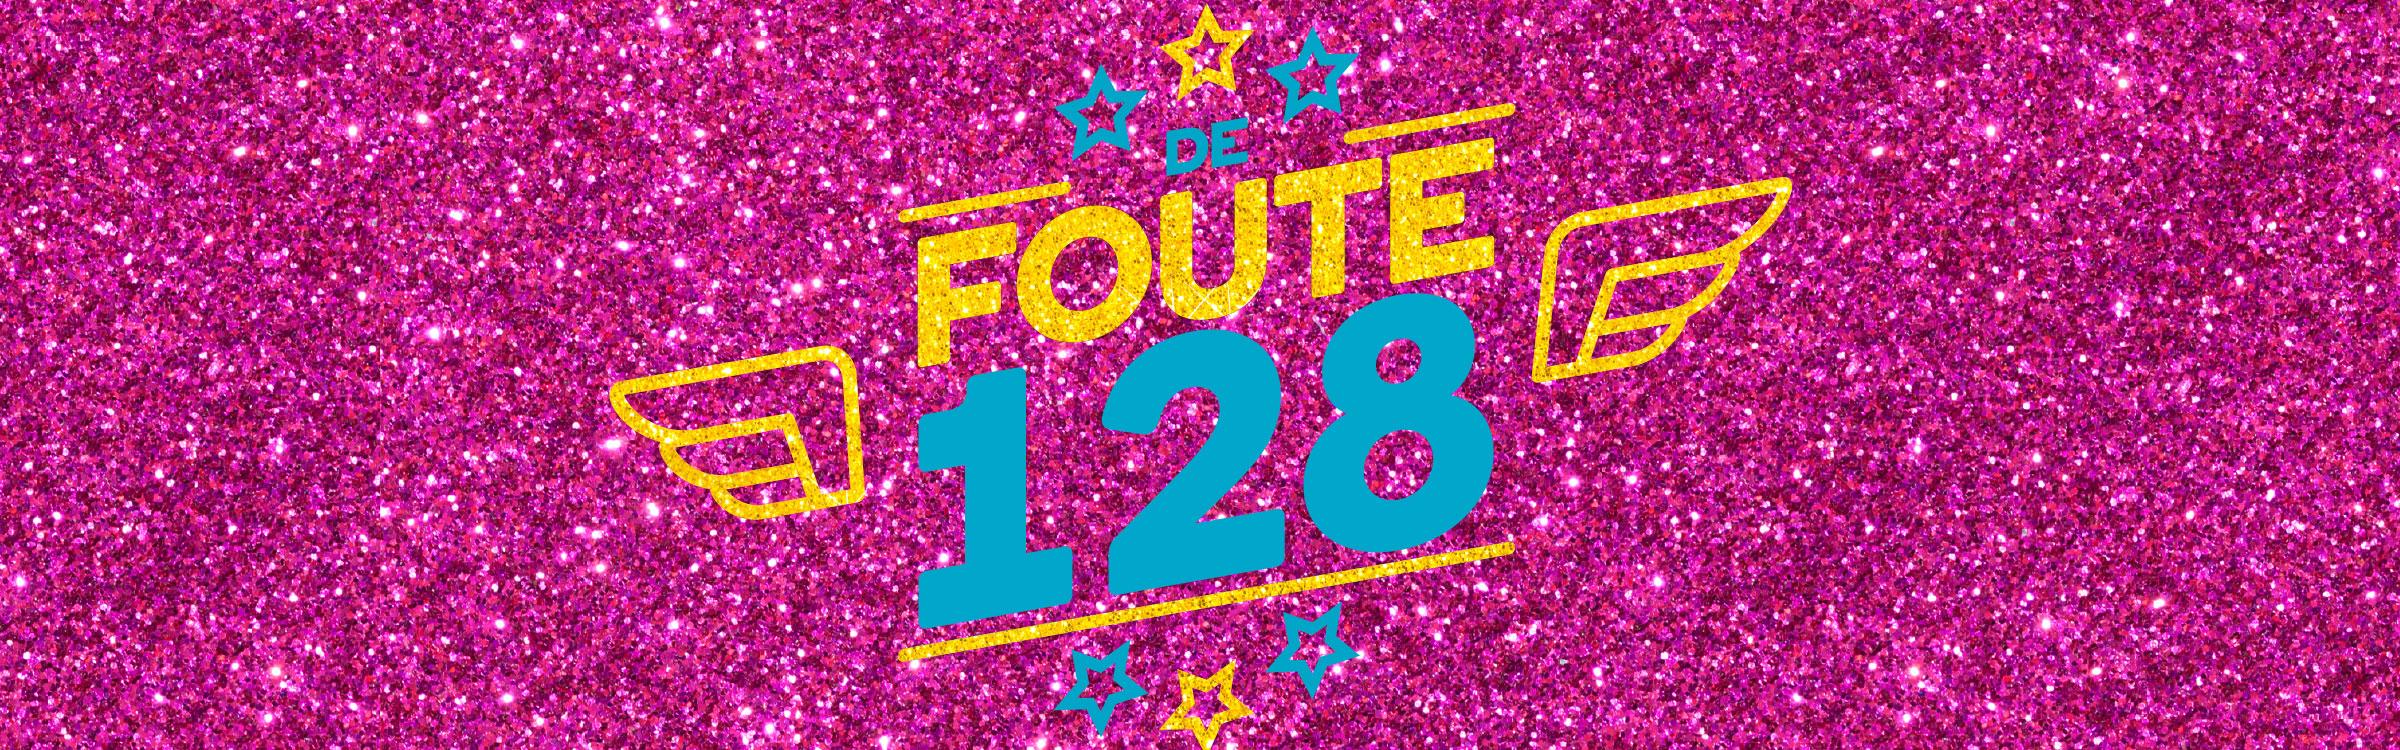 2400x750 foute128